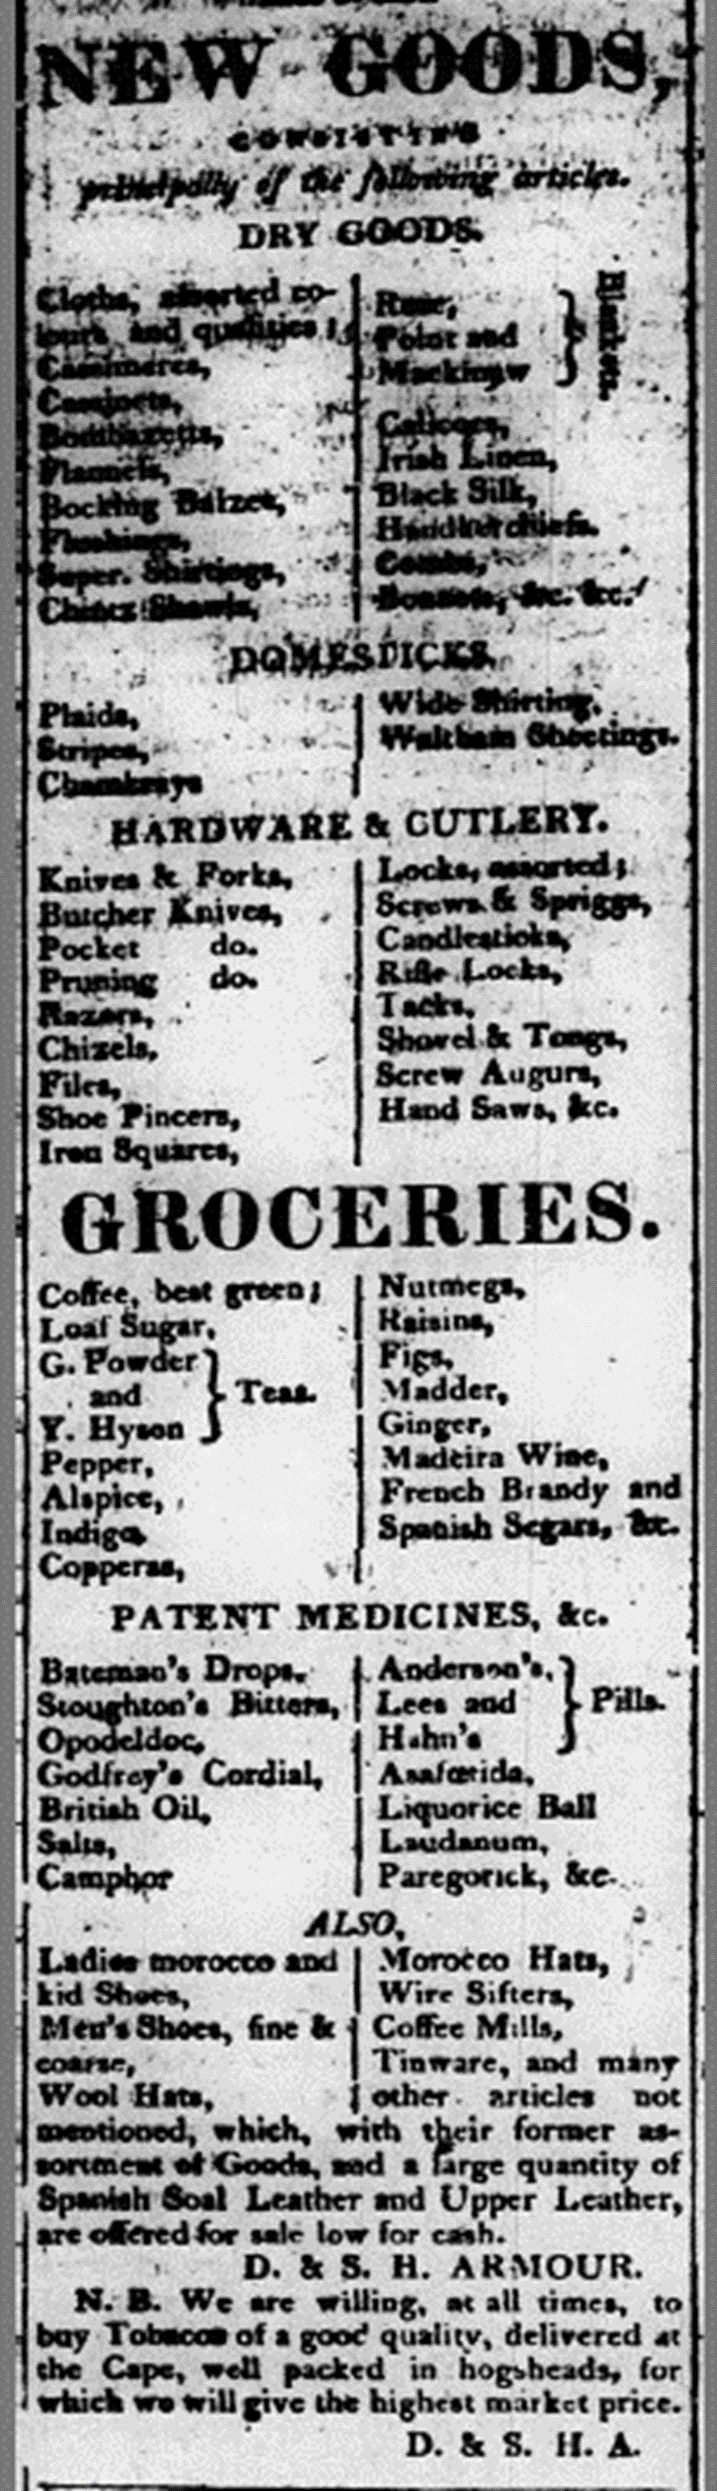 Missouri Bicentennial Minutes: Merchandise in 1821 Grocery Stores (Part 2)